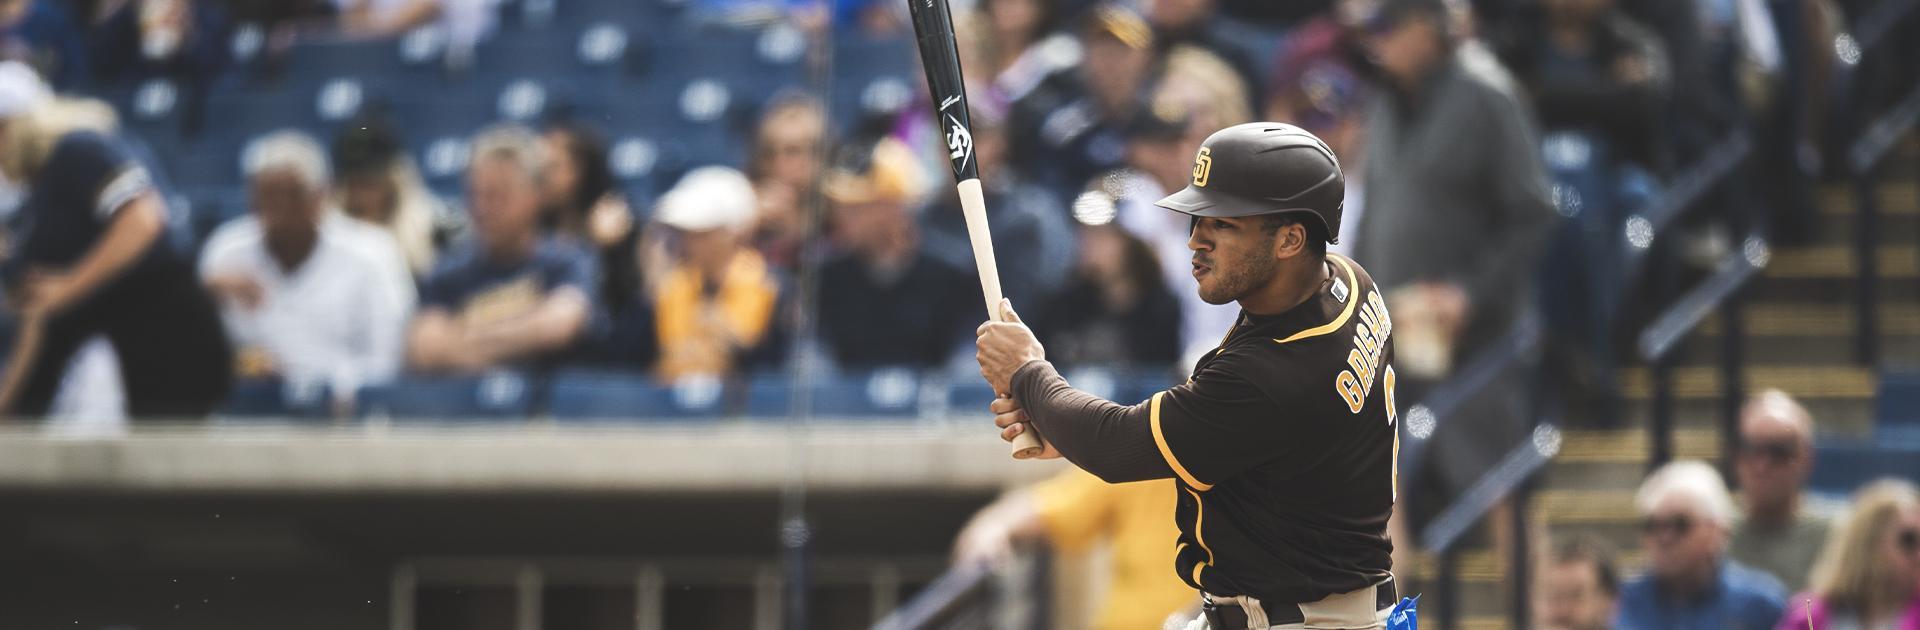 Trent-Grisham-Louisville-Slugger-Baseball-Bat